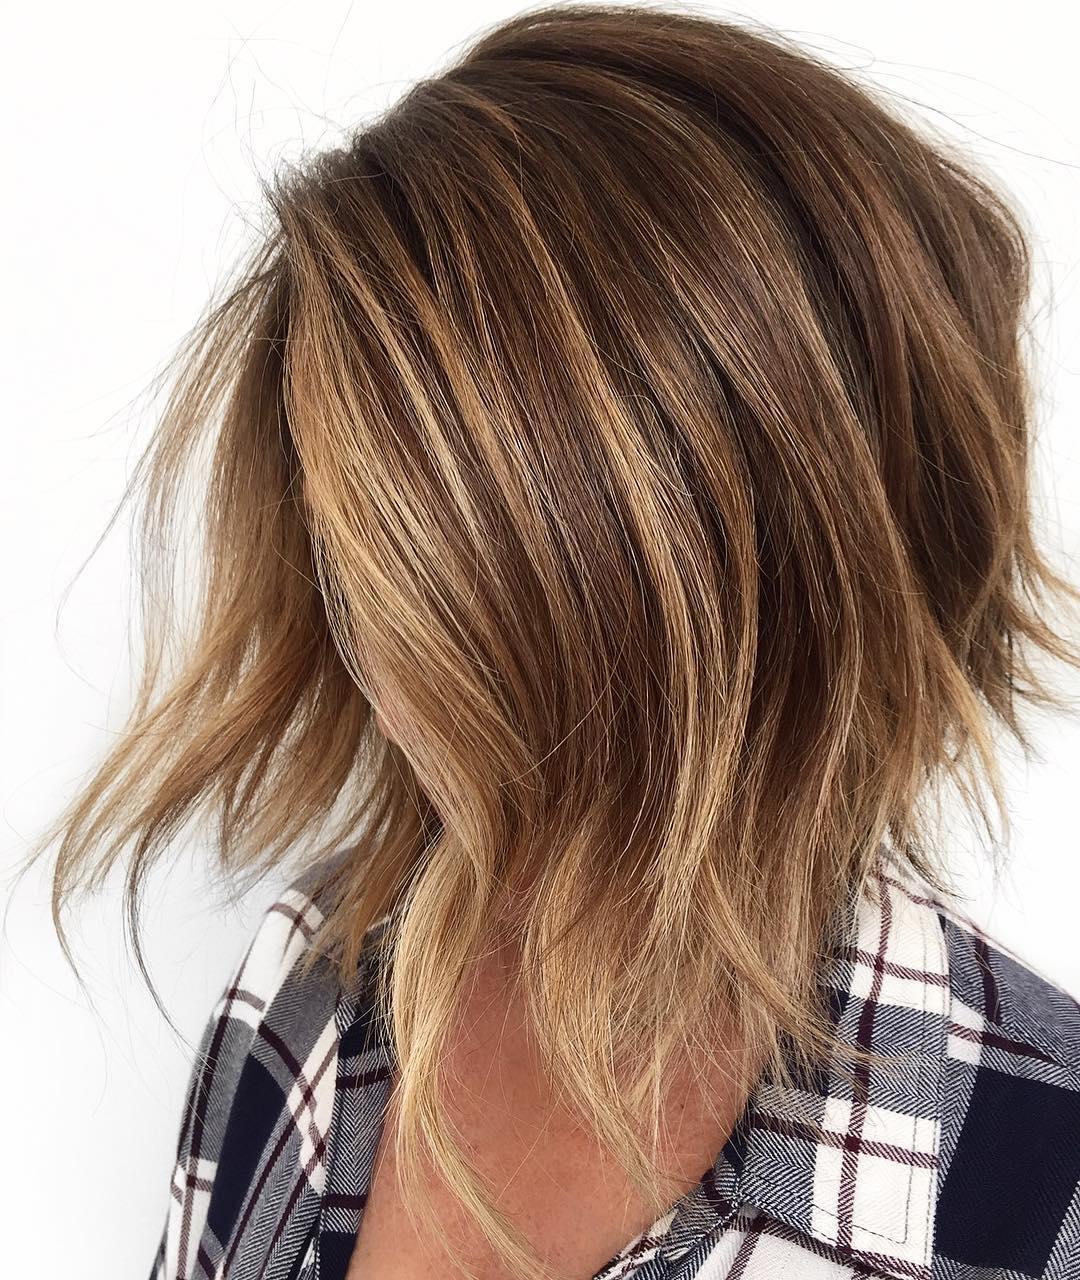 20 Dirty Blonde Hair Ideas That Work on Everyone